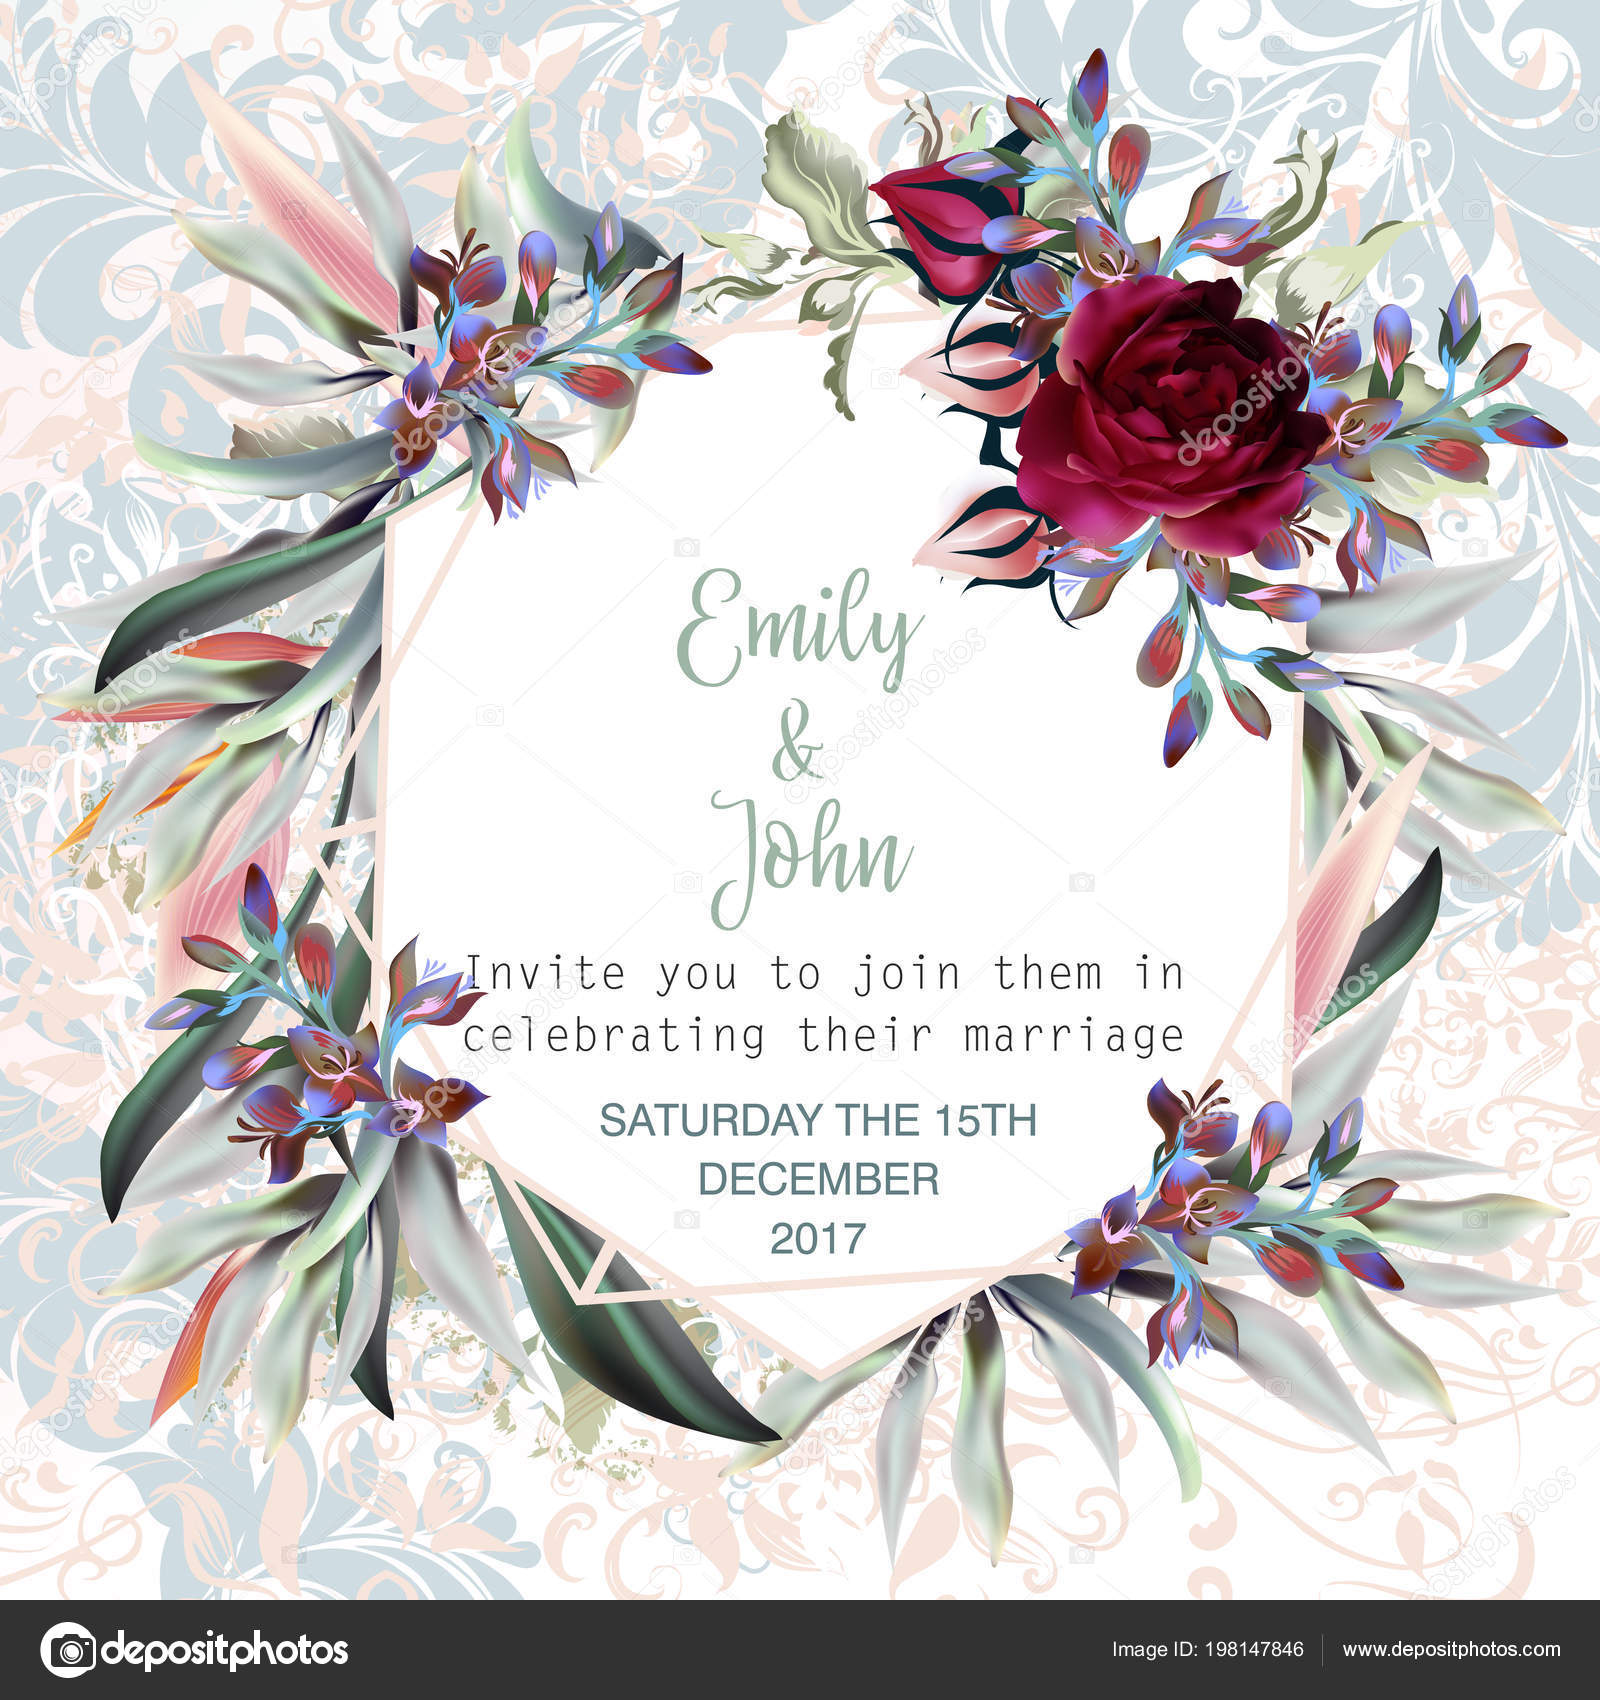 Beautiful Wedding Invitation Card Date Roses Swirls Leafs Tropical ...